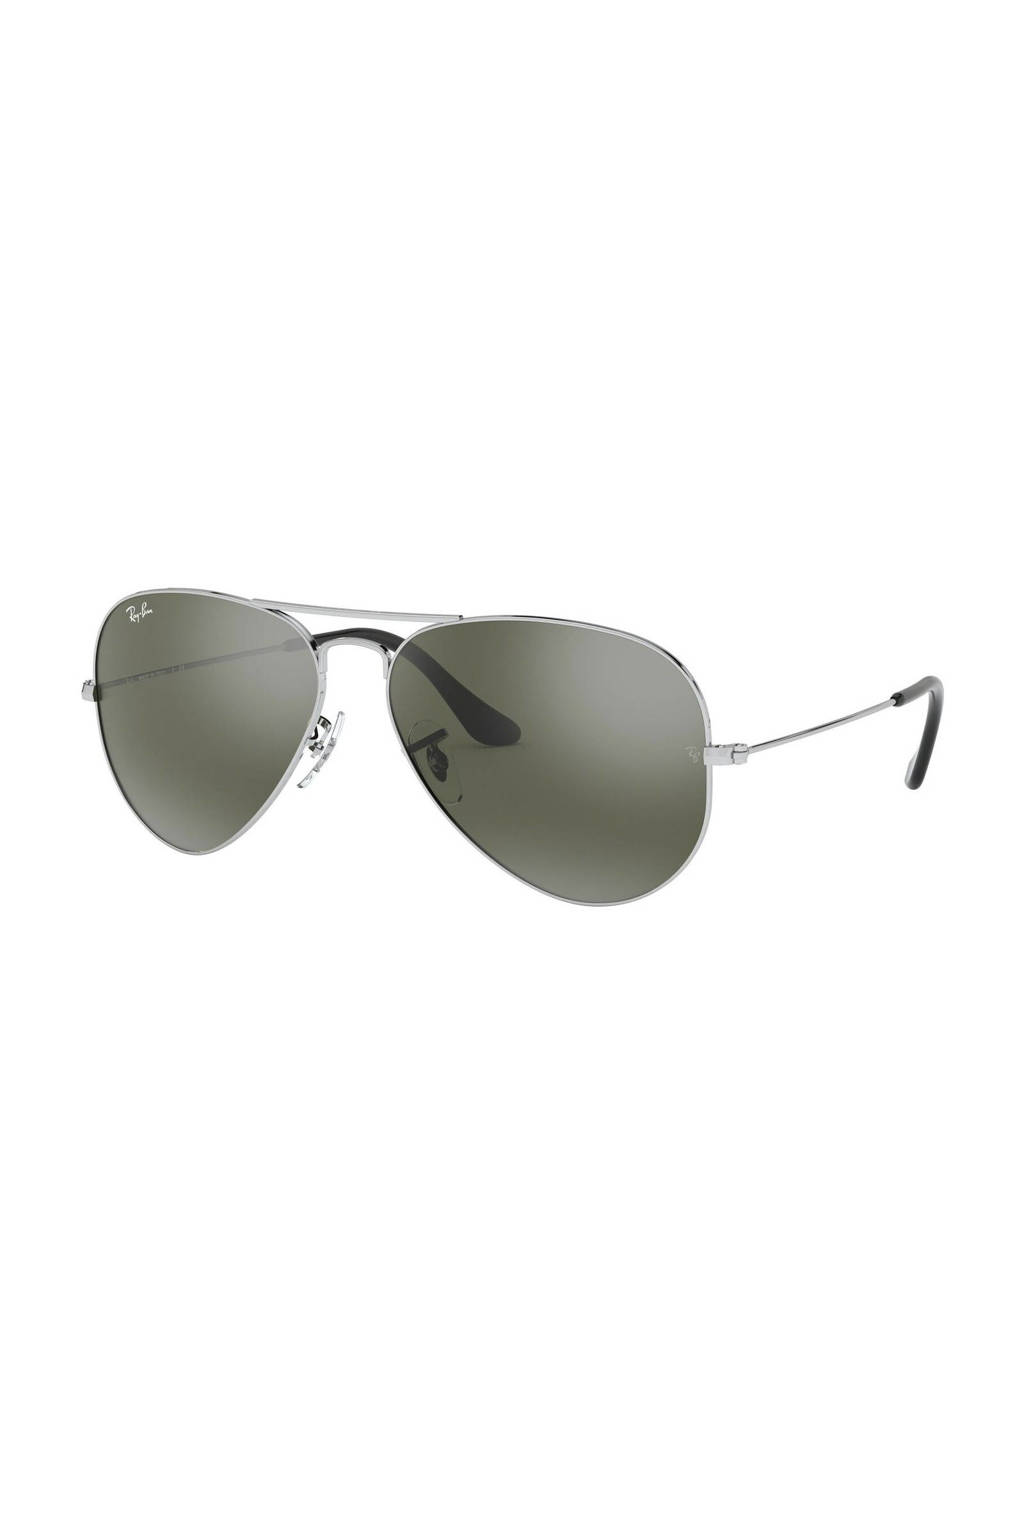 Ray-Ban zonnebril 0RB3025, Grijs